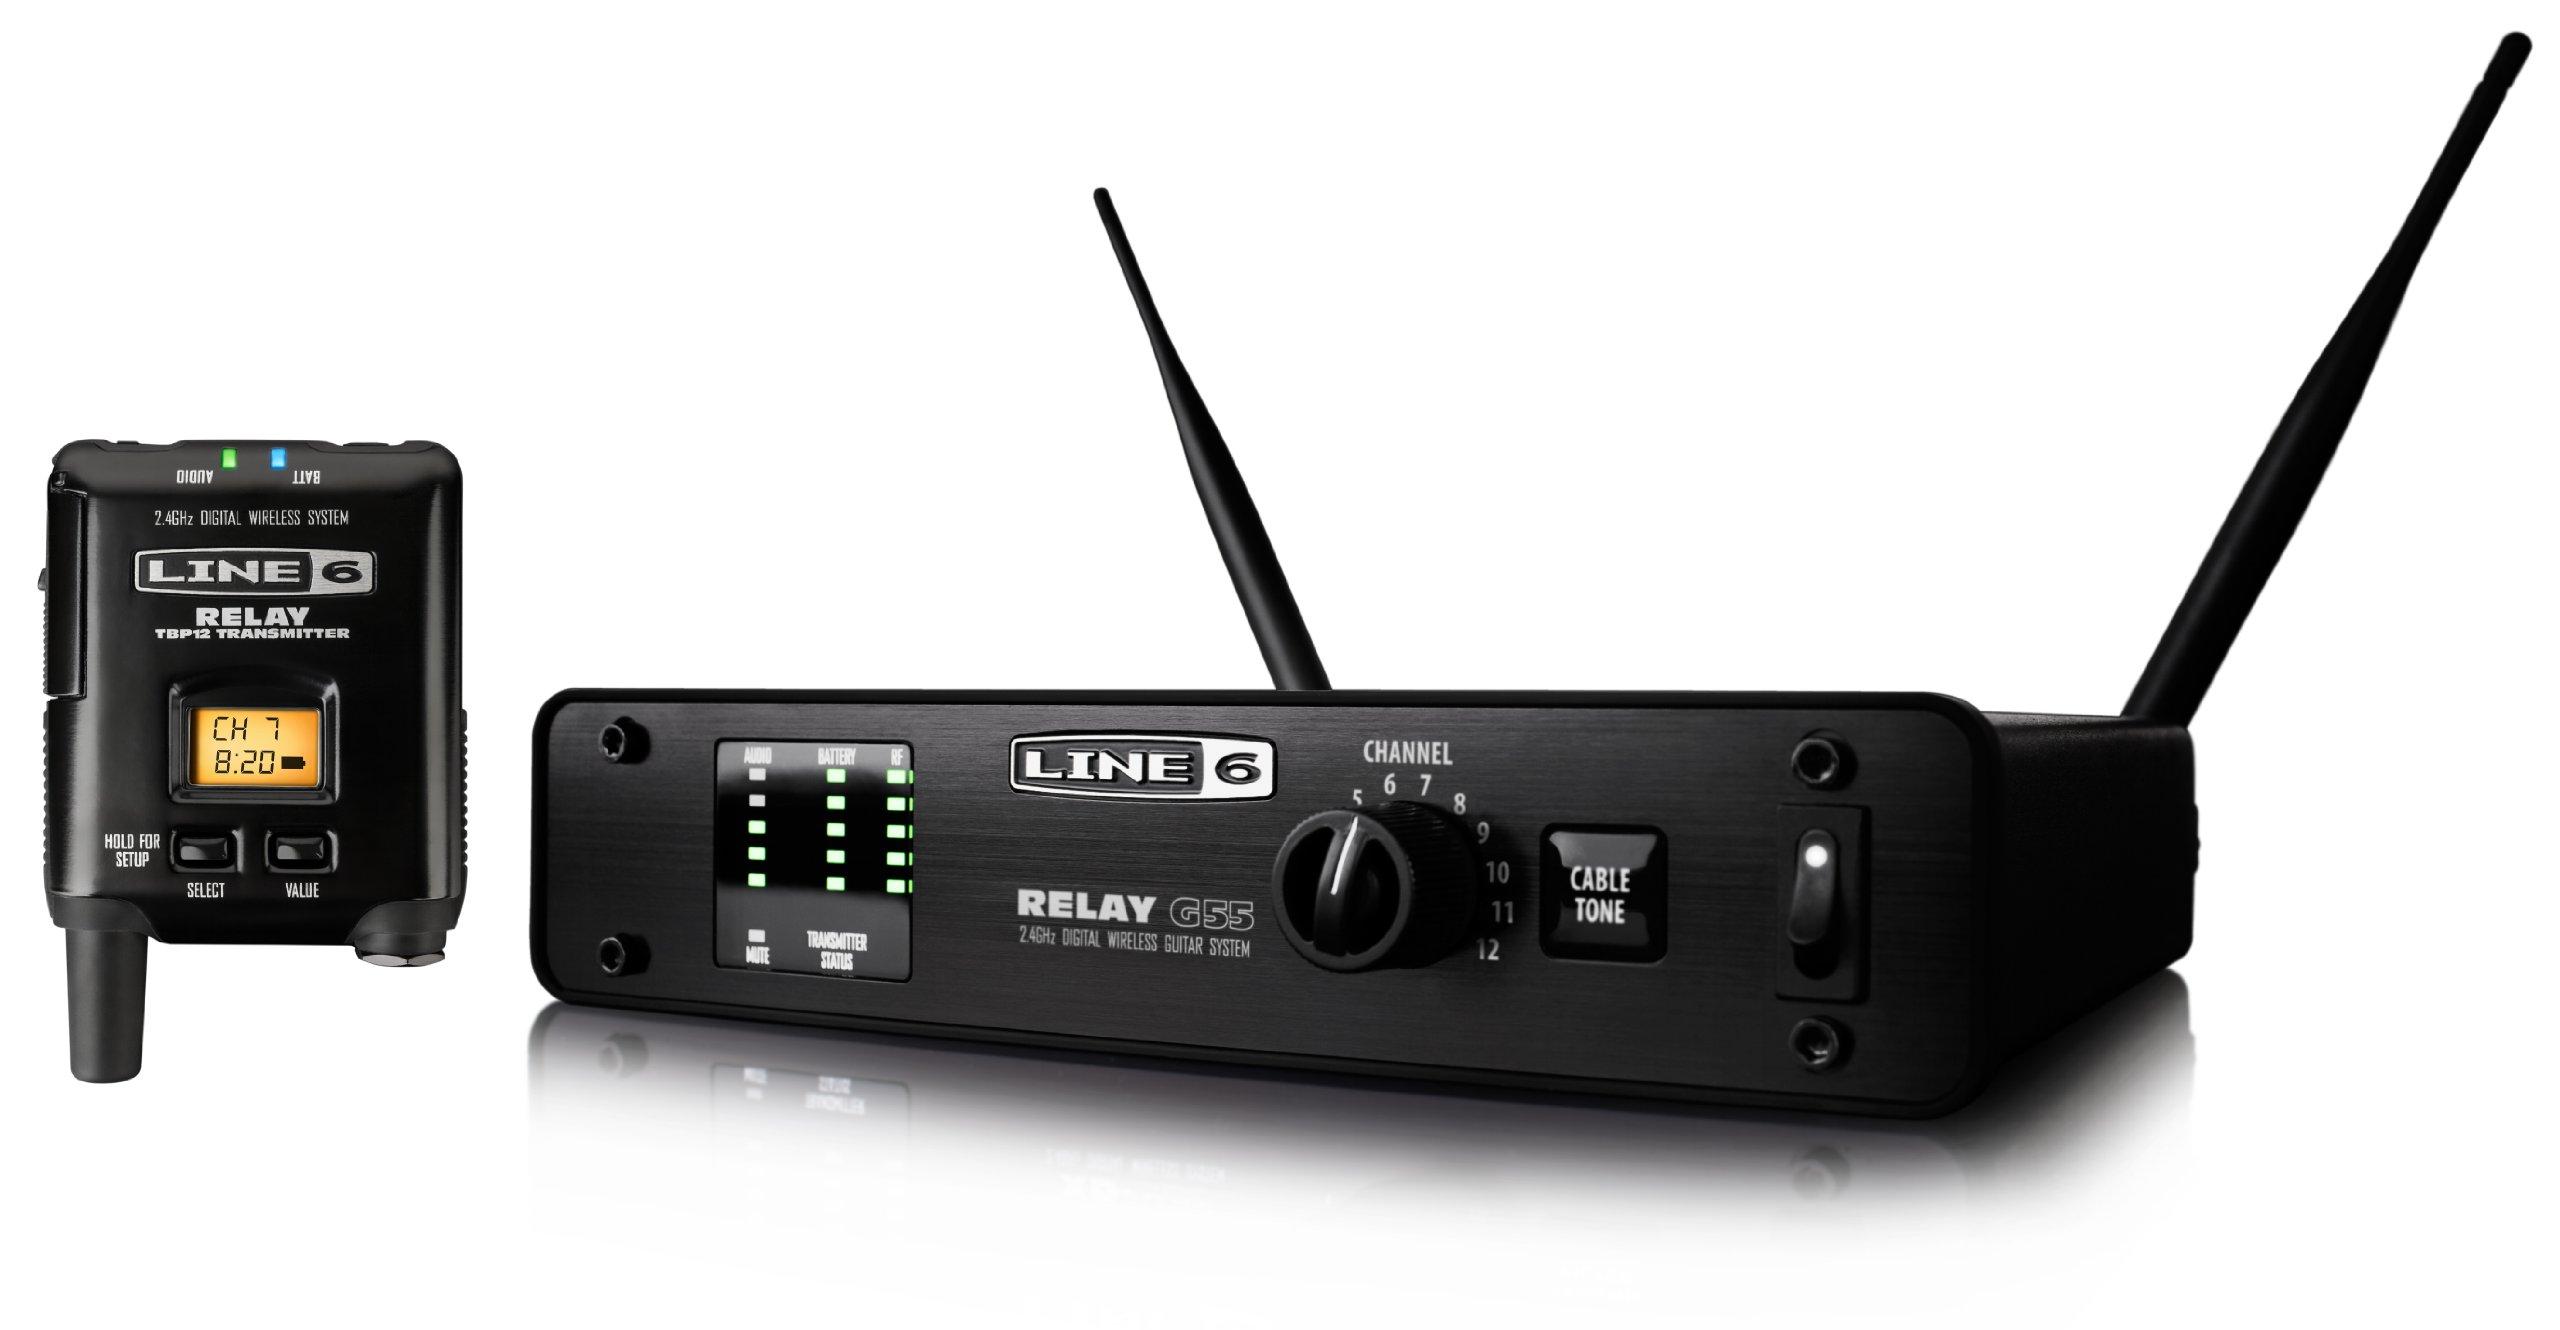 Line 6 99-123-0145 Relay G55 Digital Guitar Wireless System by Line 6